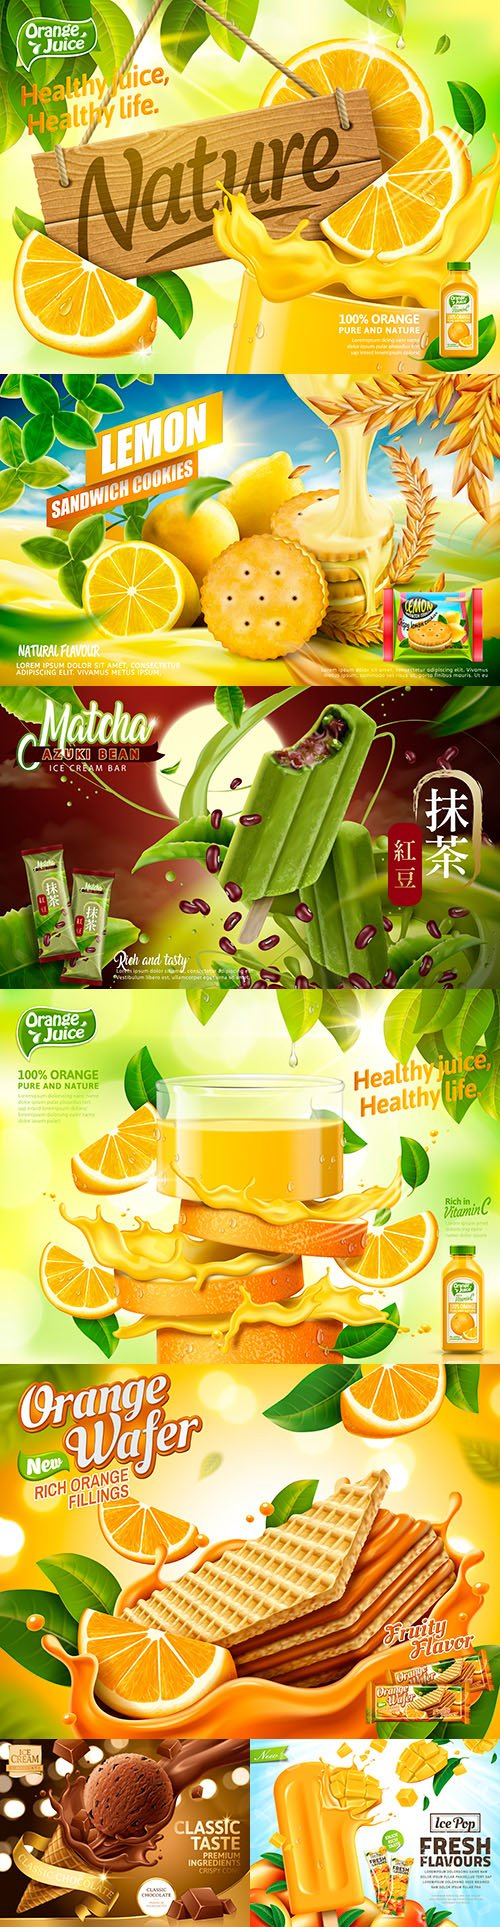 Advertising orange juice and tasty ice cream realistic design